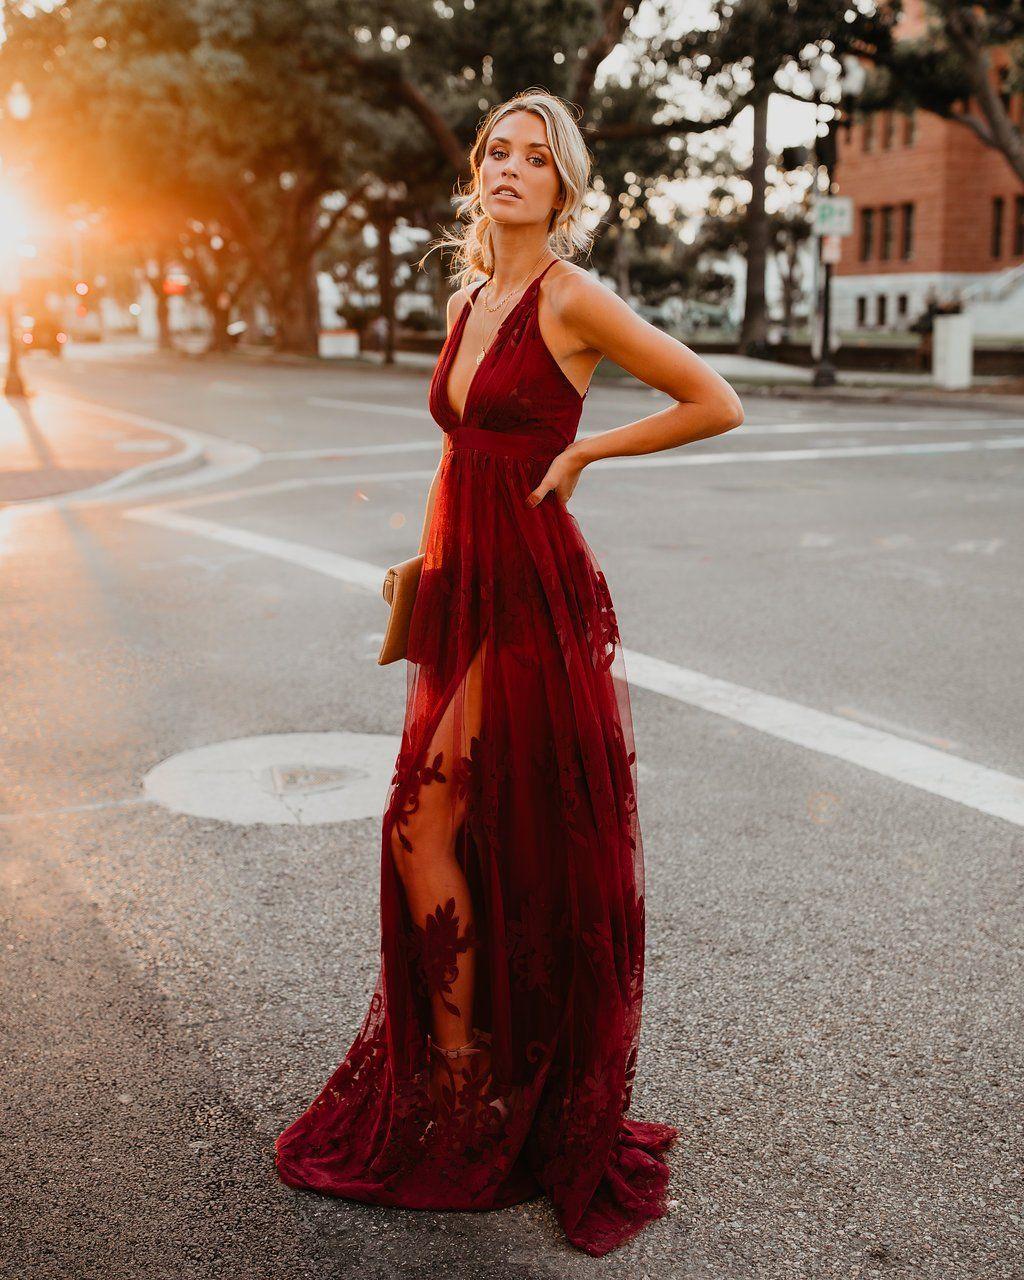 Antonia Maxi Dress Wine Long Prom Gowns Photoshoot Dress Burgundy Prom Dress [ 1280 x 1024 Pixel ]